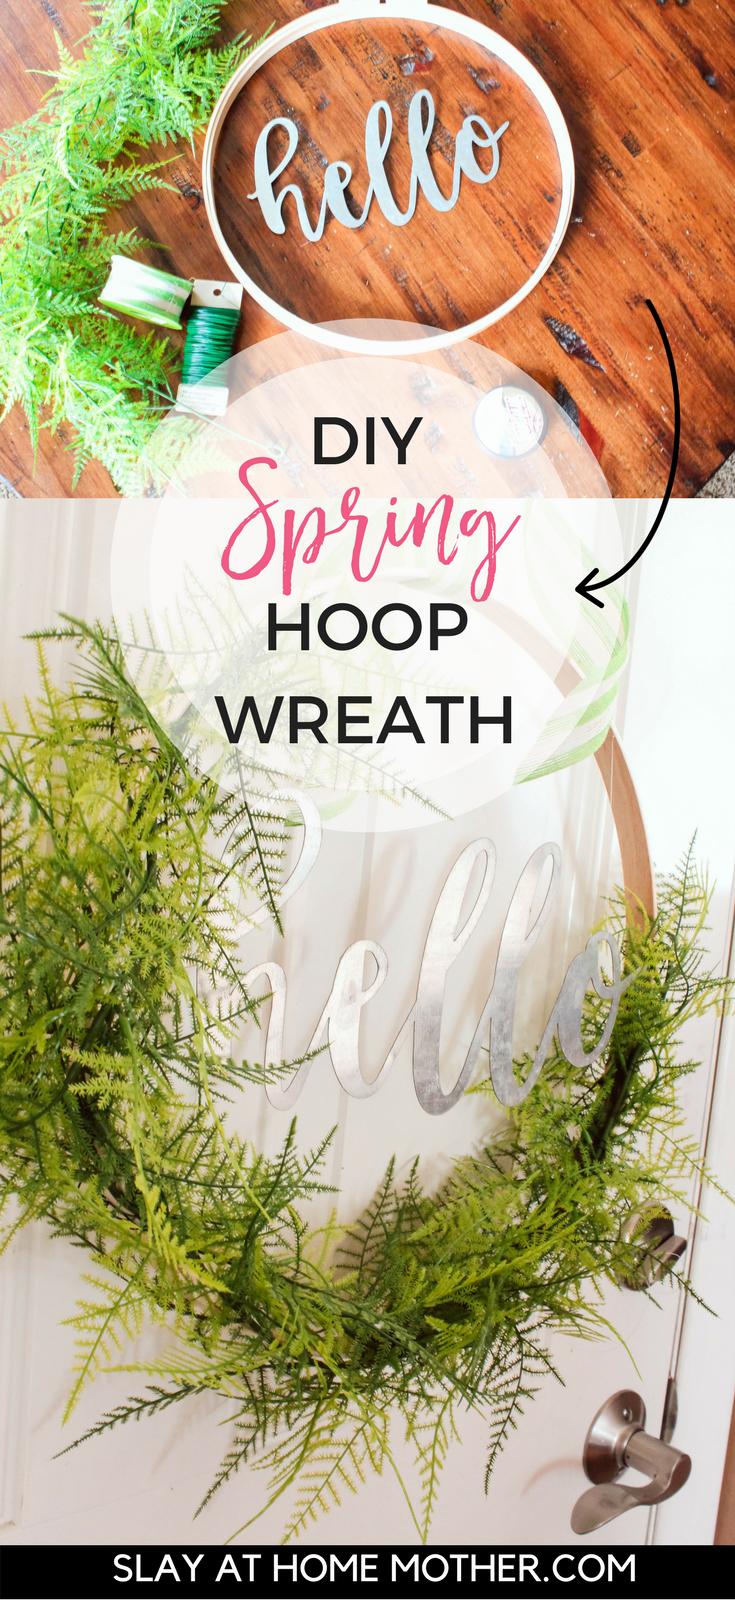 DIY Spring Hoop Wreath ($25) - #hoopwreath #springwreath #diywreath #slayathomemother #diyhomedecor SlayAtHomeMother.com